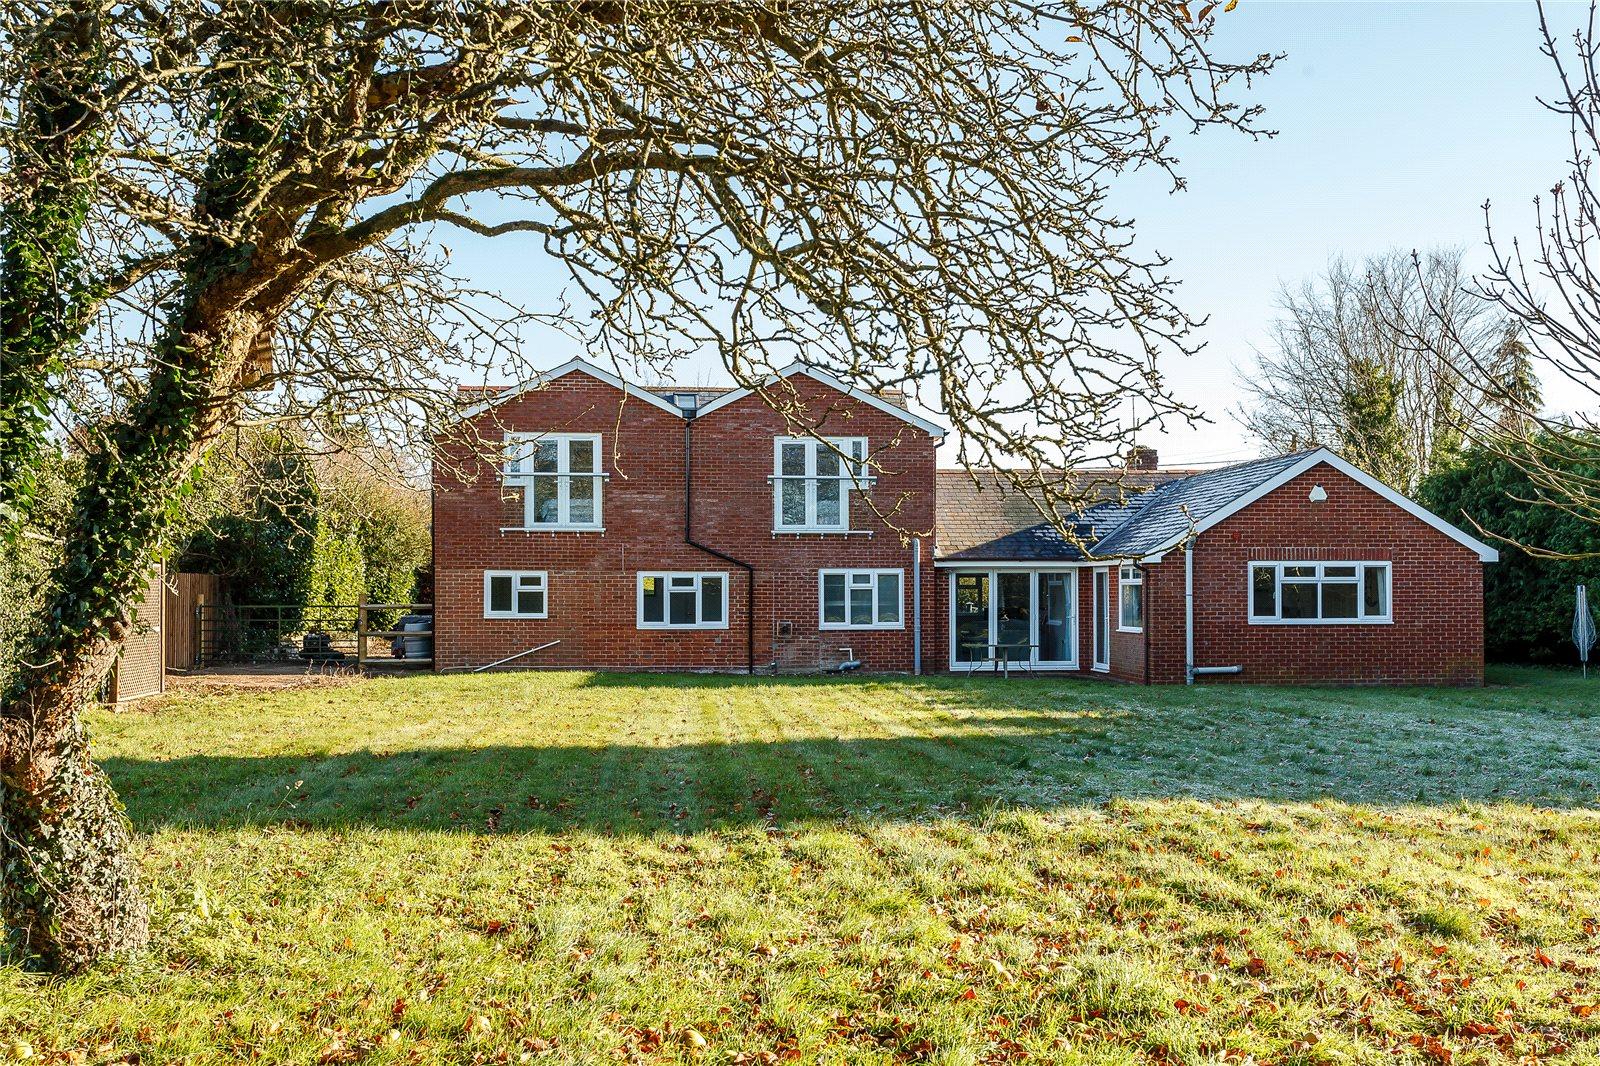 Casa para uma família para Venda às King Lane, Over Wallop, Stockbridge, Hampshire, SO20 Stockbridge, Inglaterra